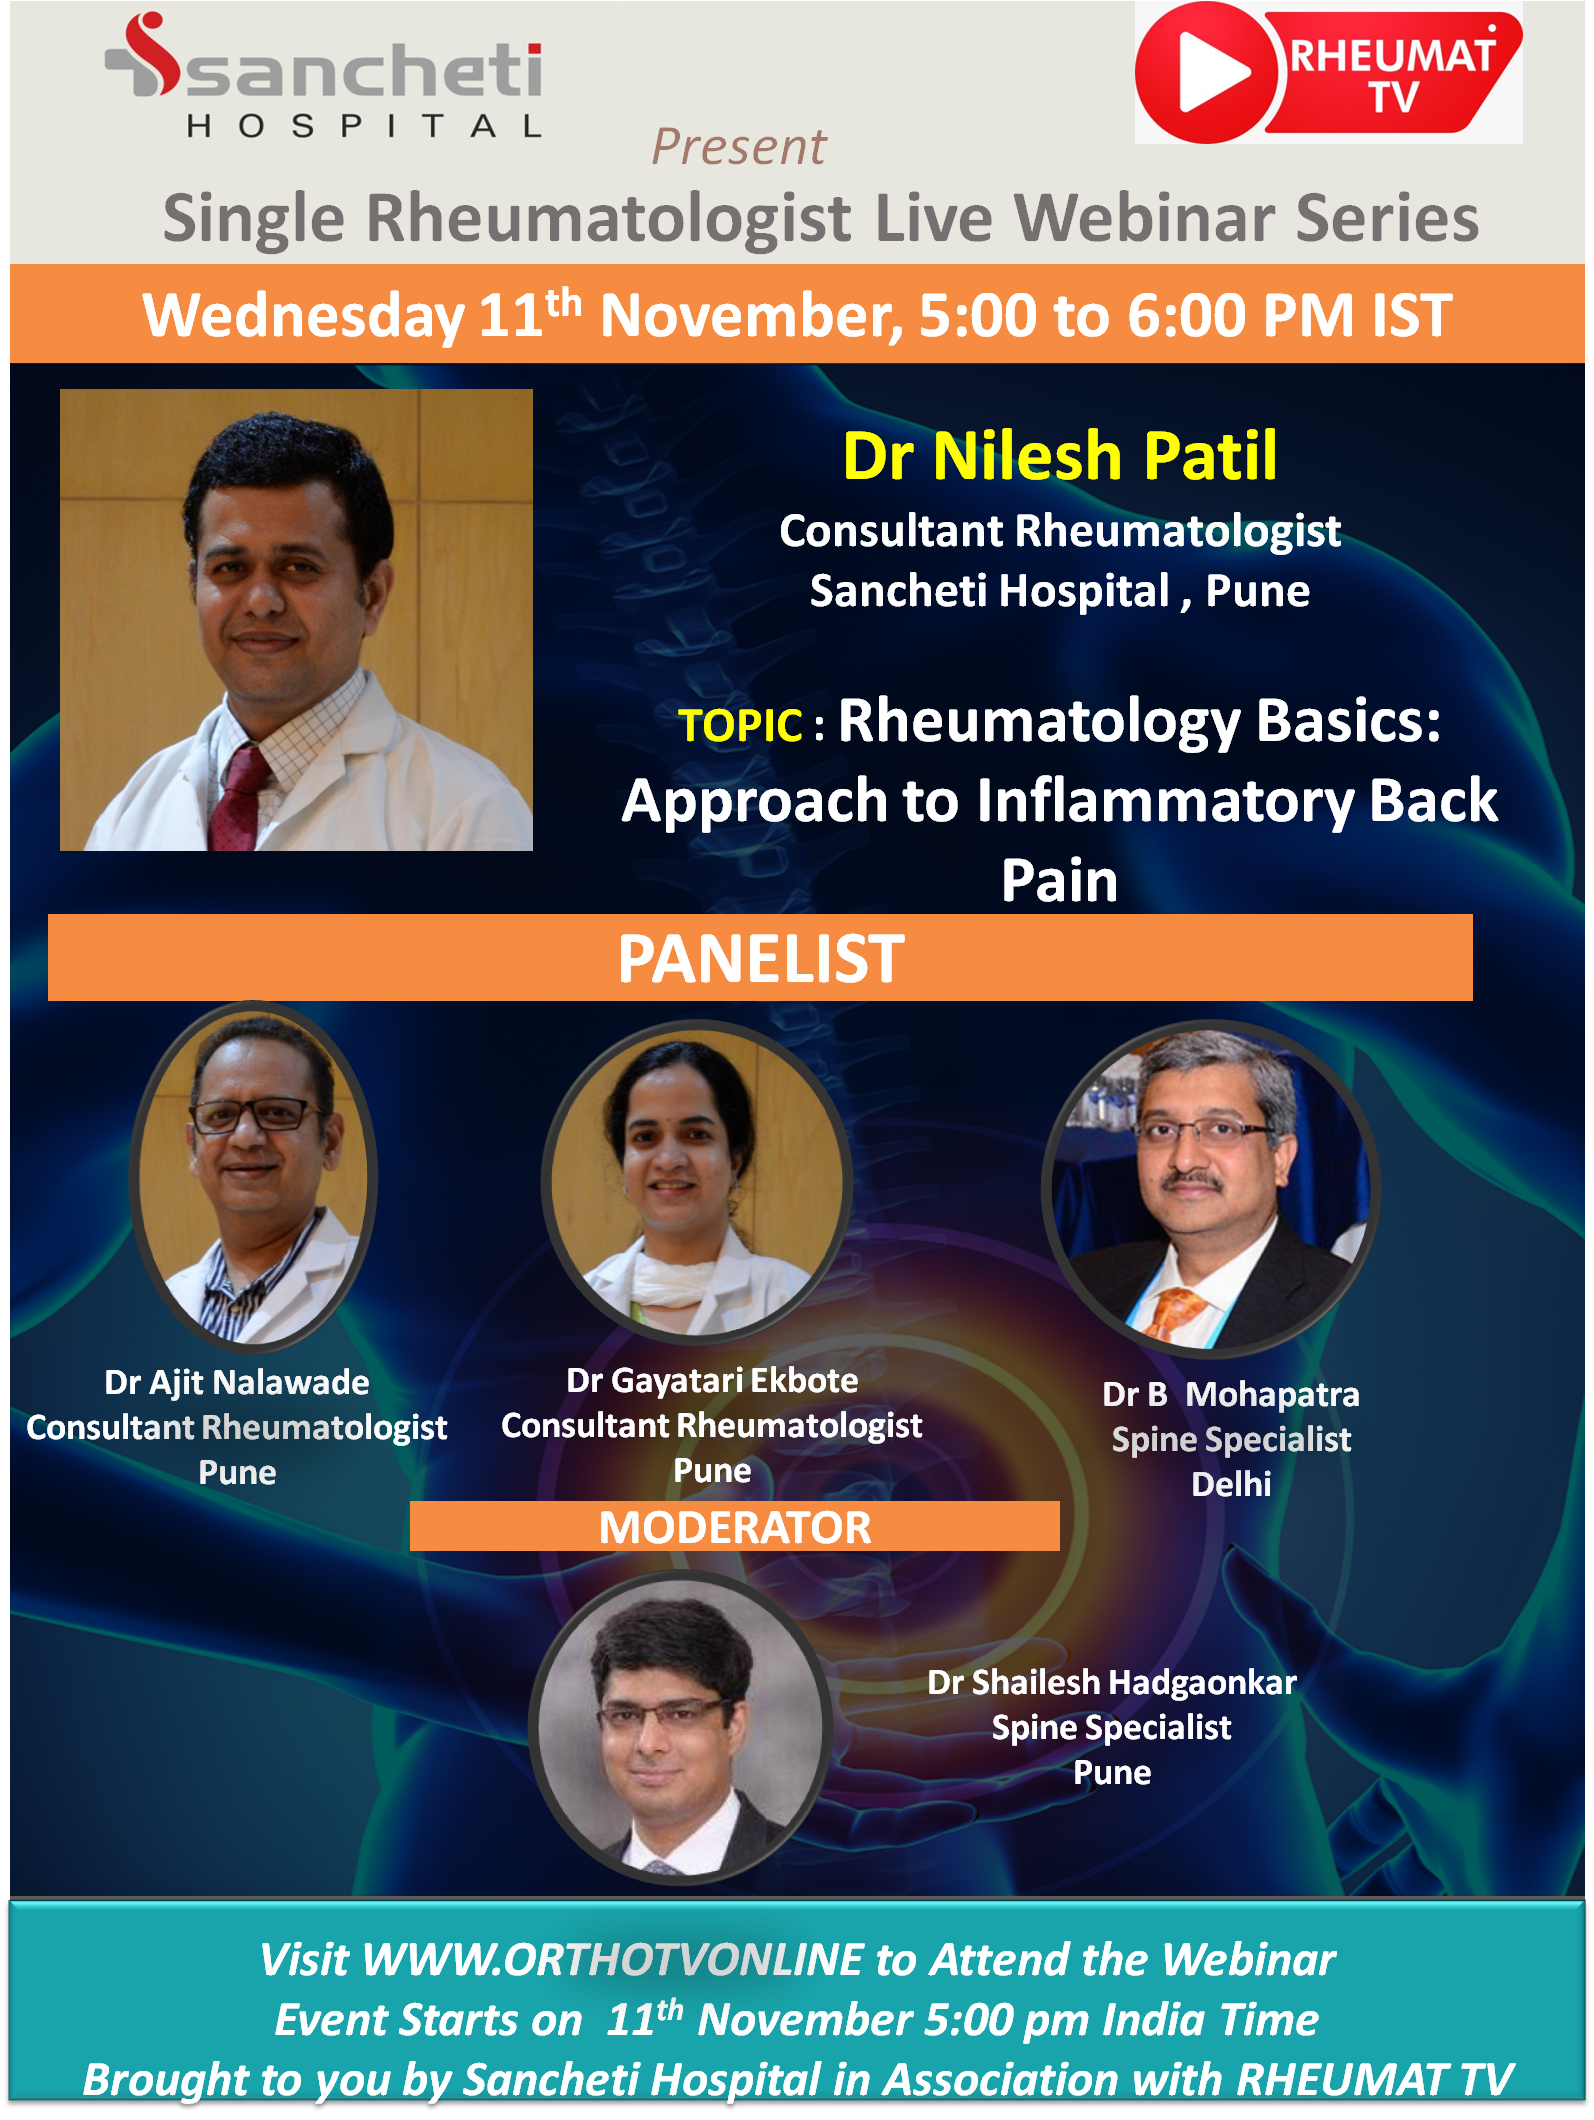 - Rheumat 2 - RHEUMAT TV : Rheumatology Basics: Approach to Inflammatory Back Pain by Dr NILESH PATIL